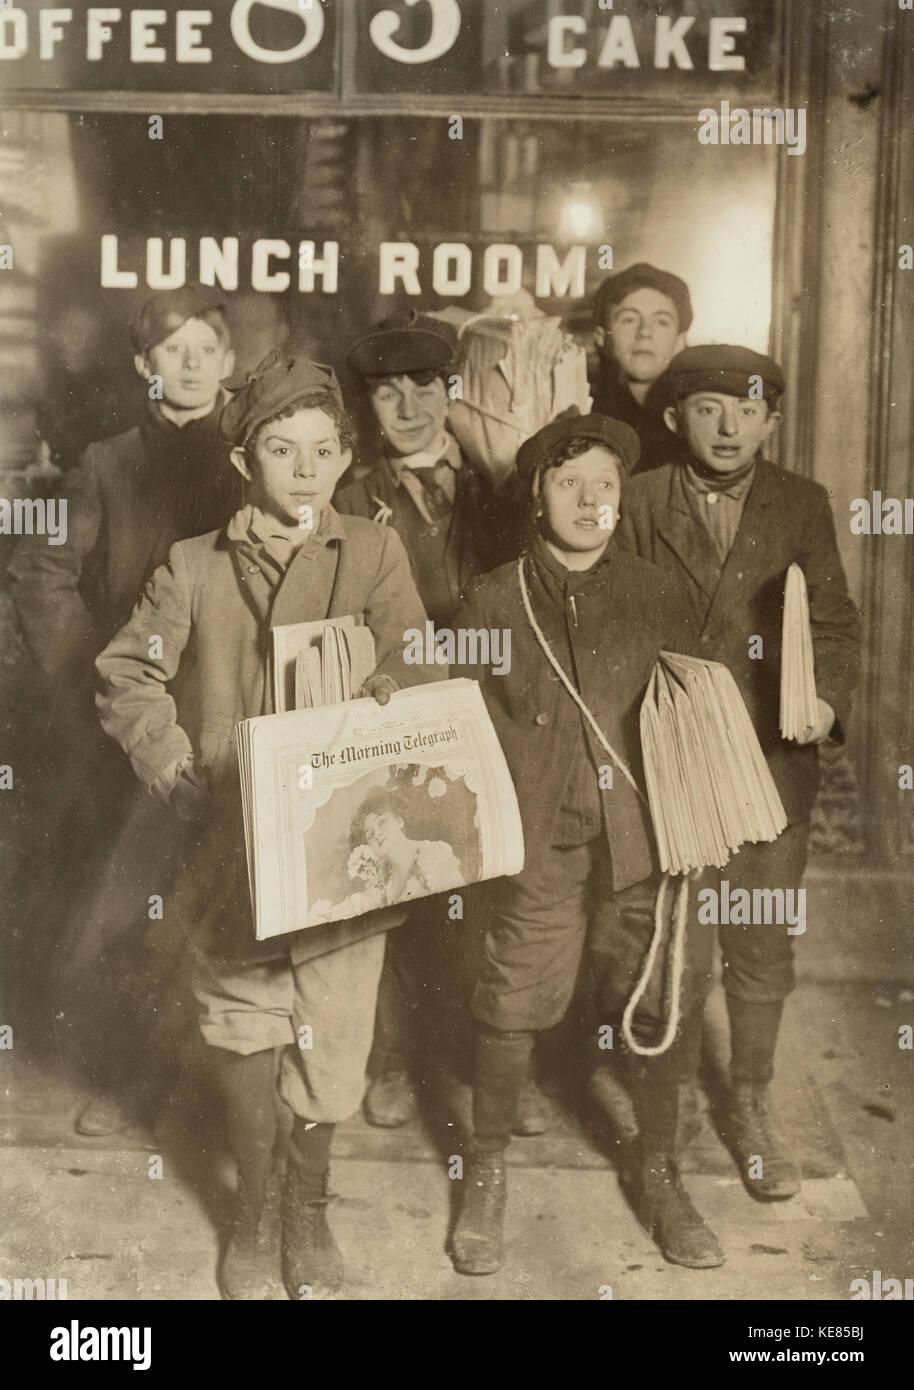 Newspaper Boys Stock Photos & Newspaper Boys Stock Images - Alamy